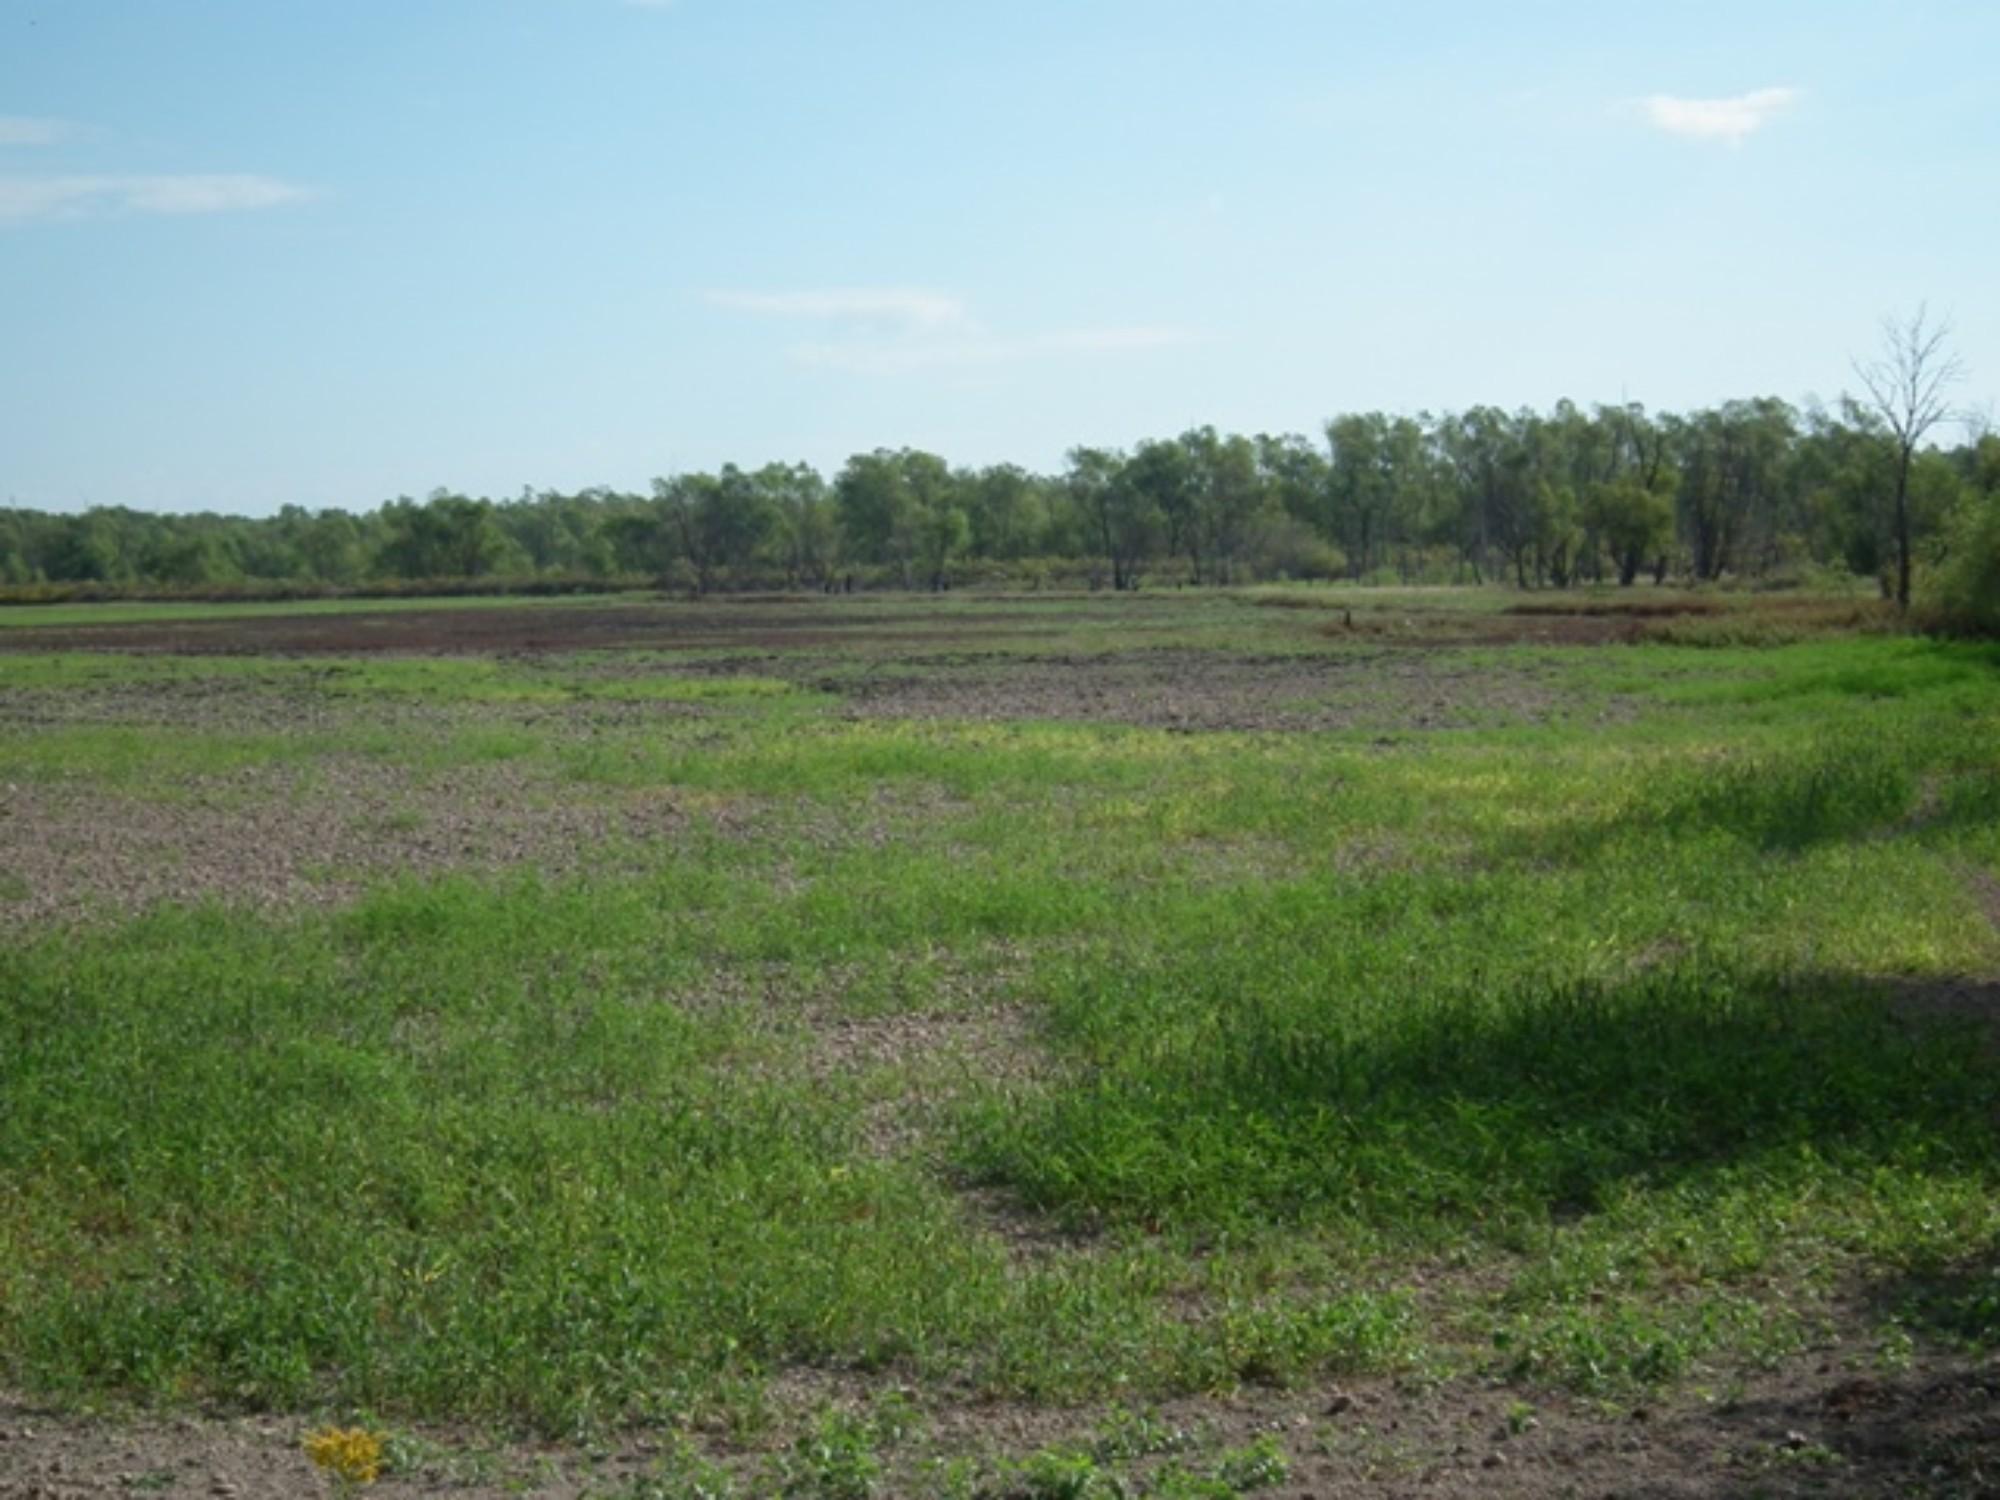 20 Duck Impoundment with Millet